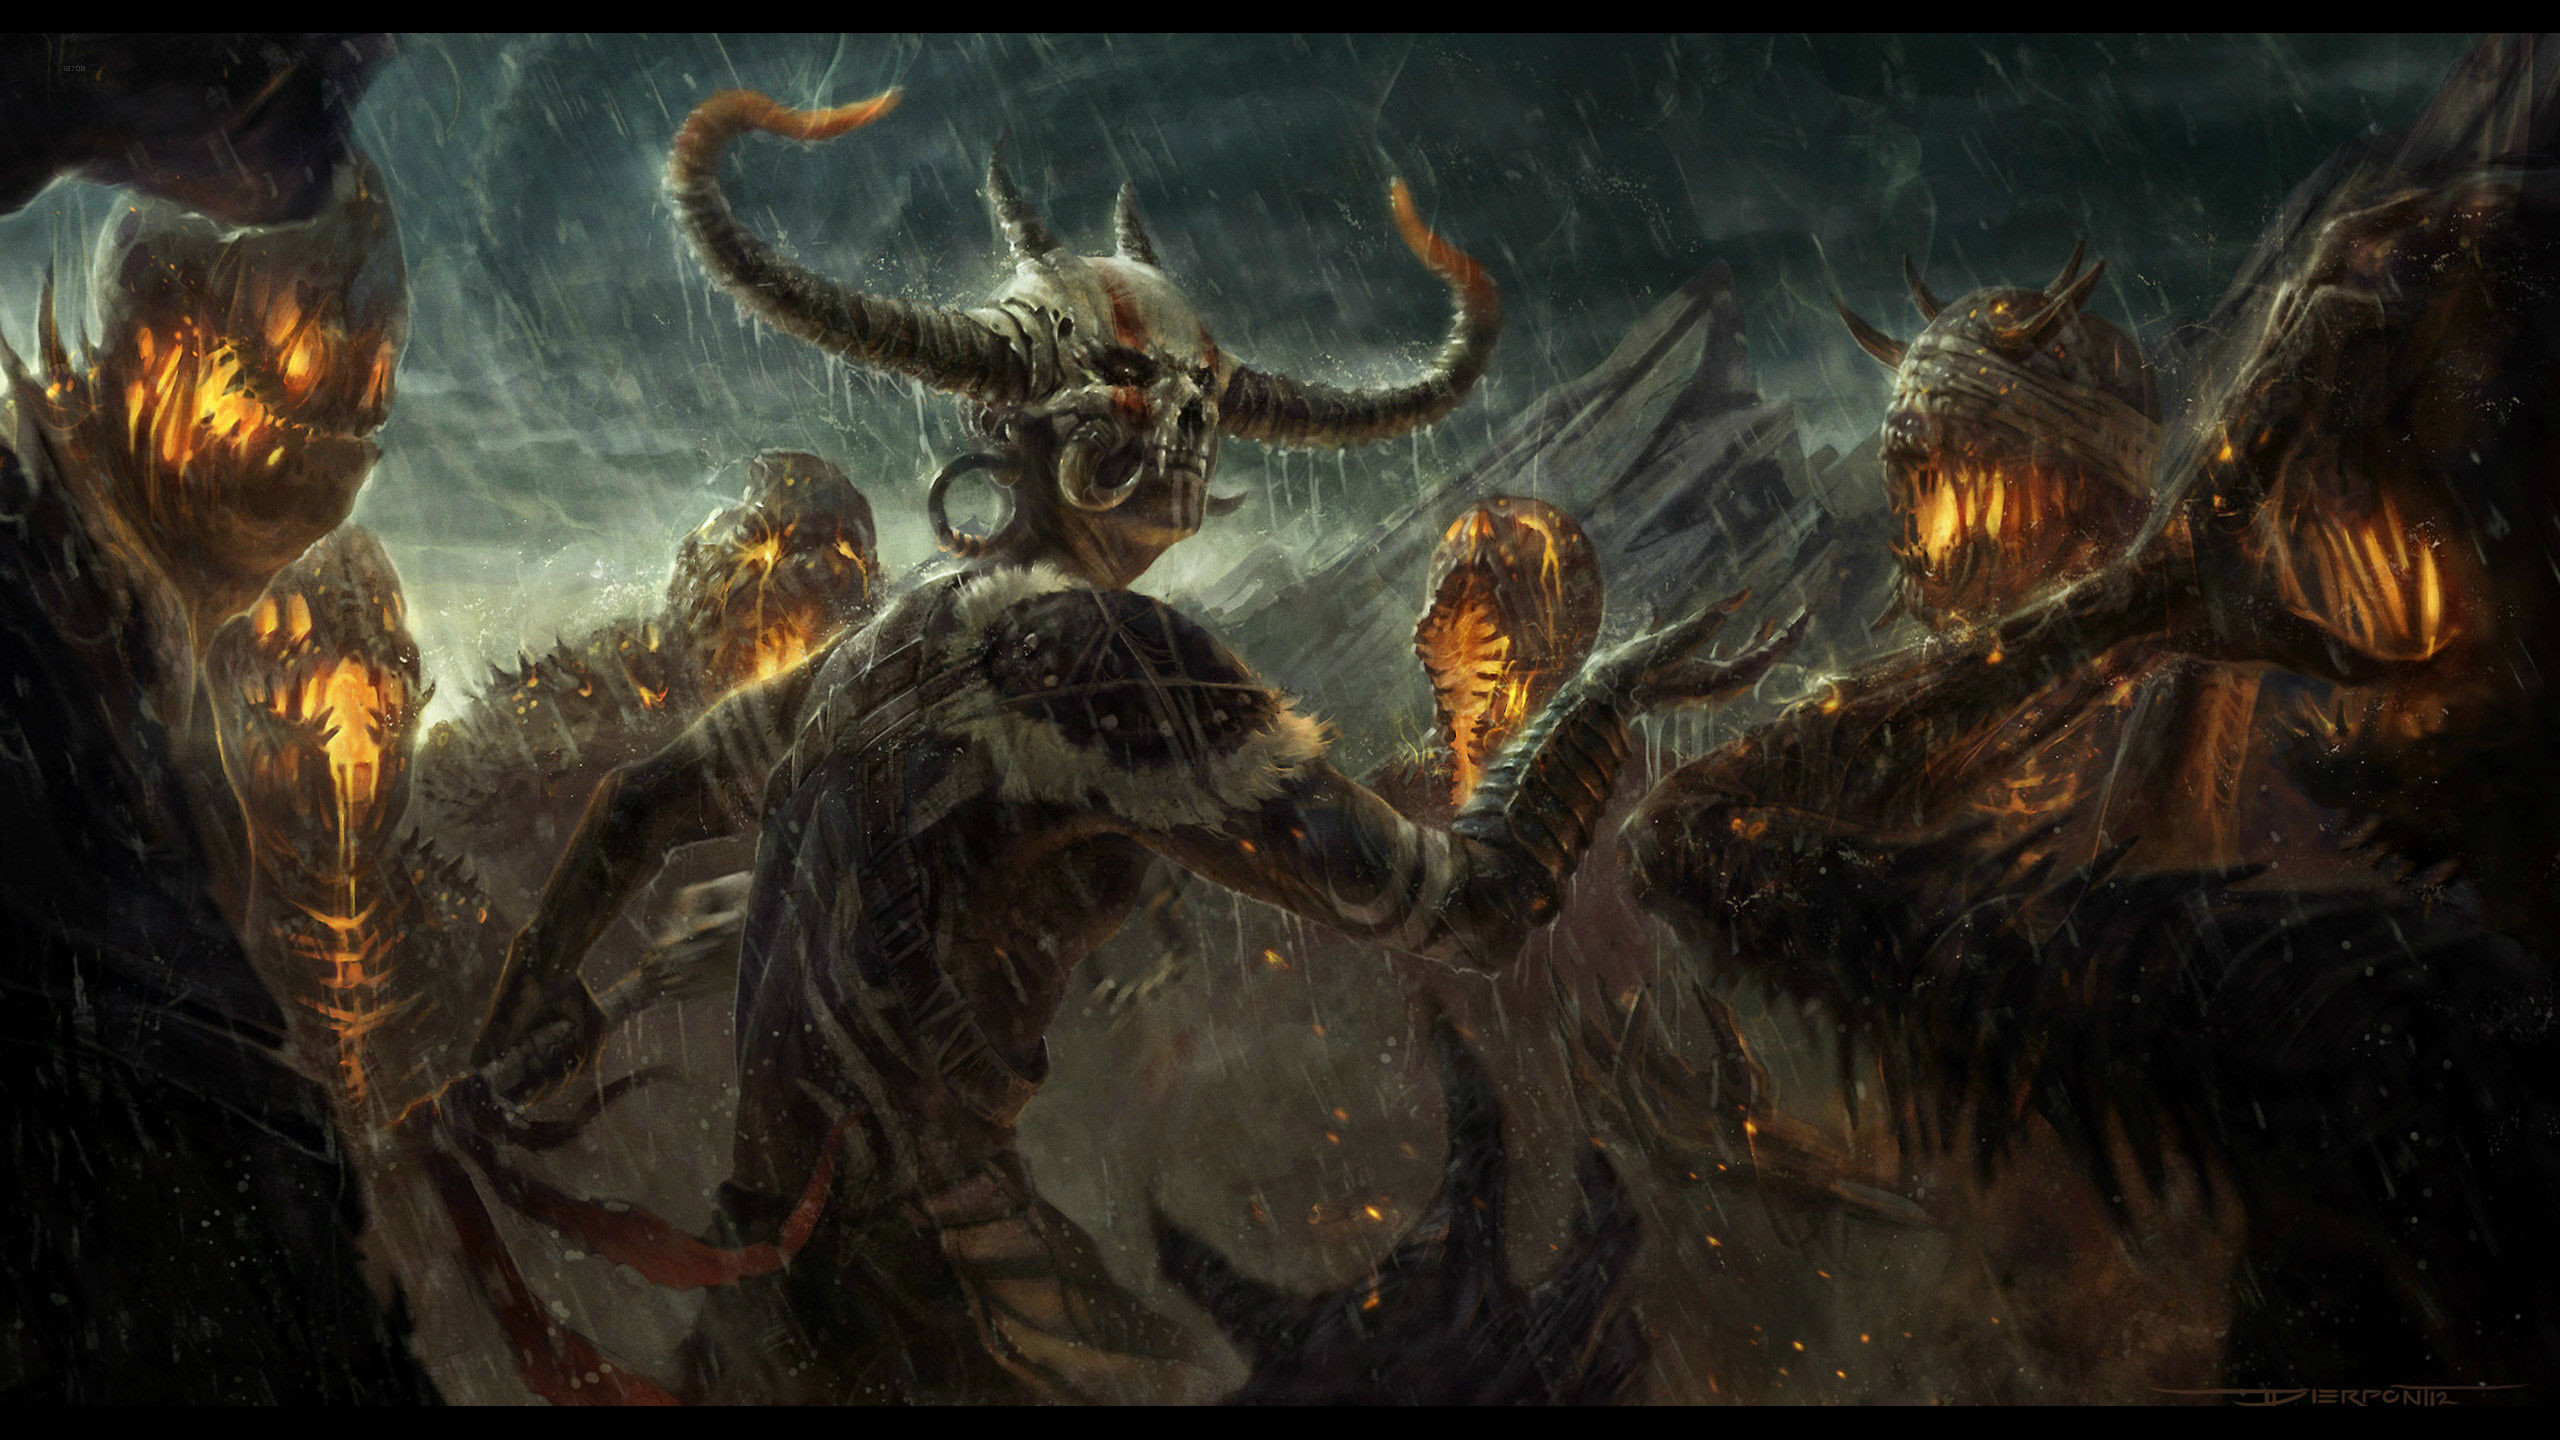 Demonic Summoner HD Wallpaper From Gallsource.com